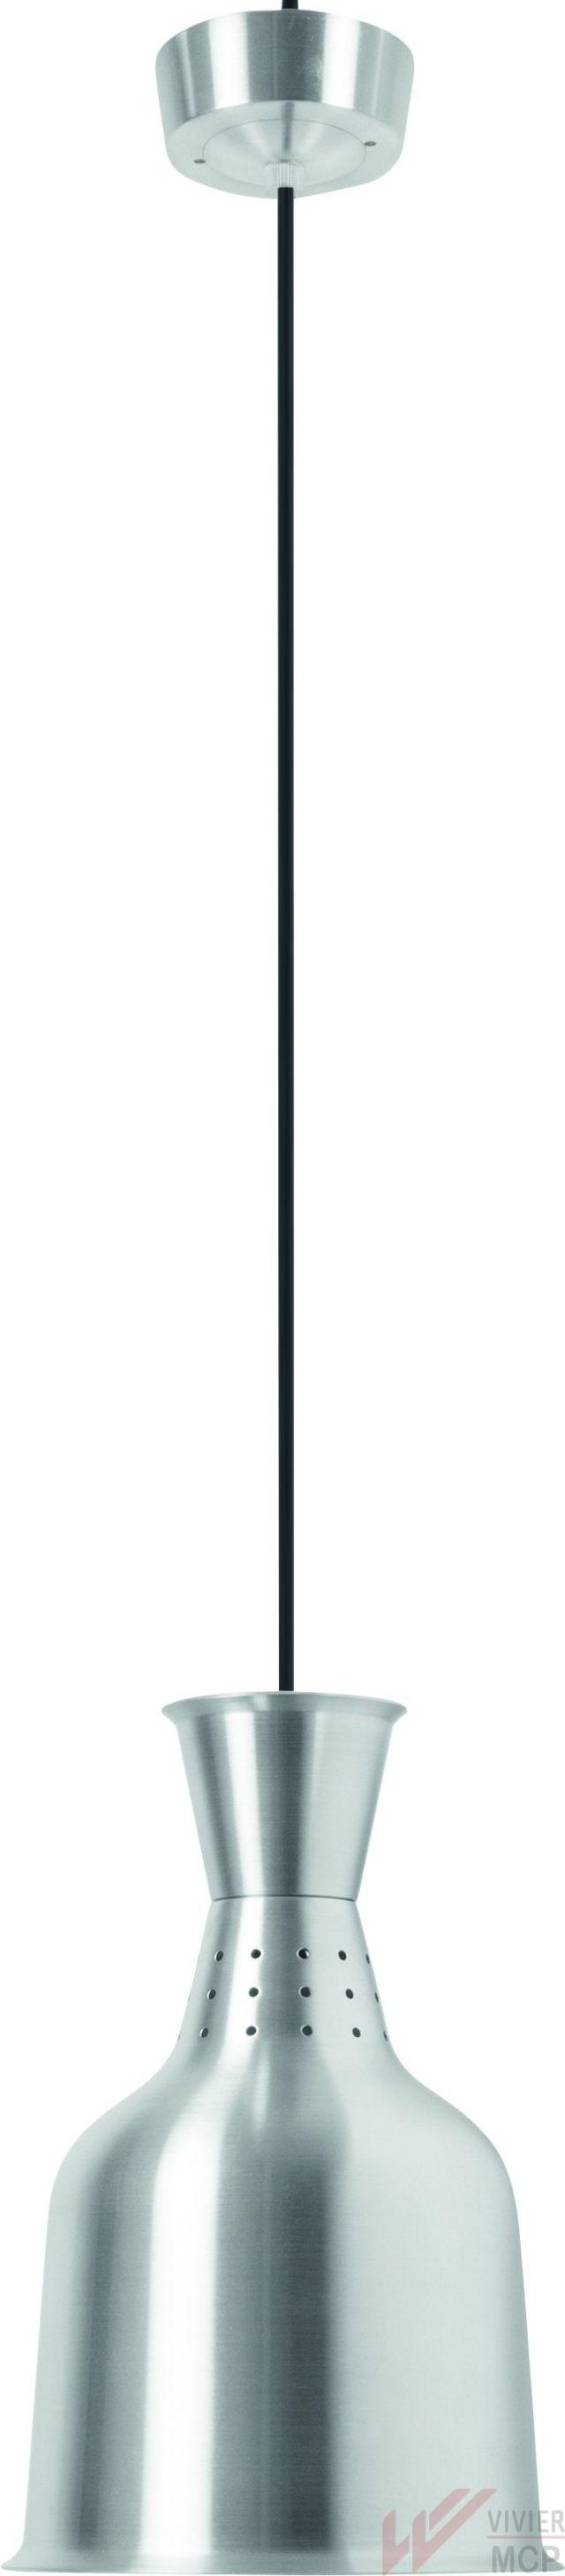 Lampe chauffe plat infrarouge suspendue